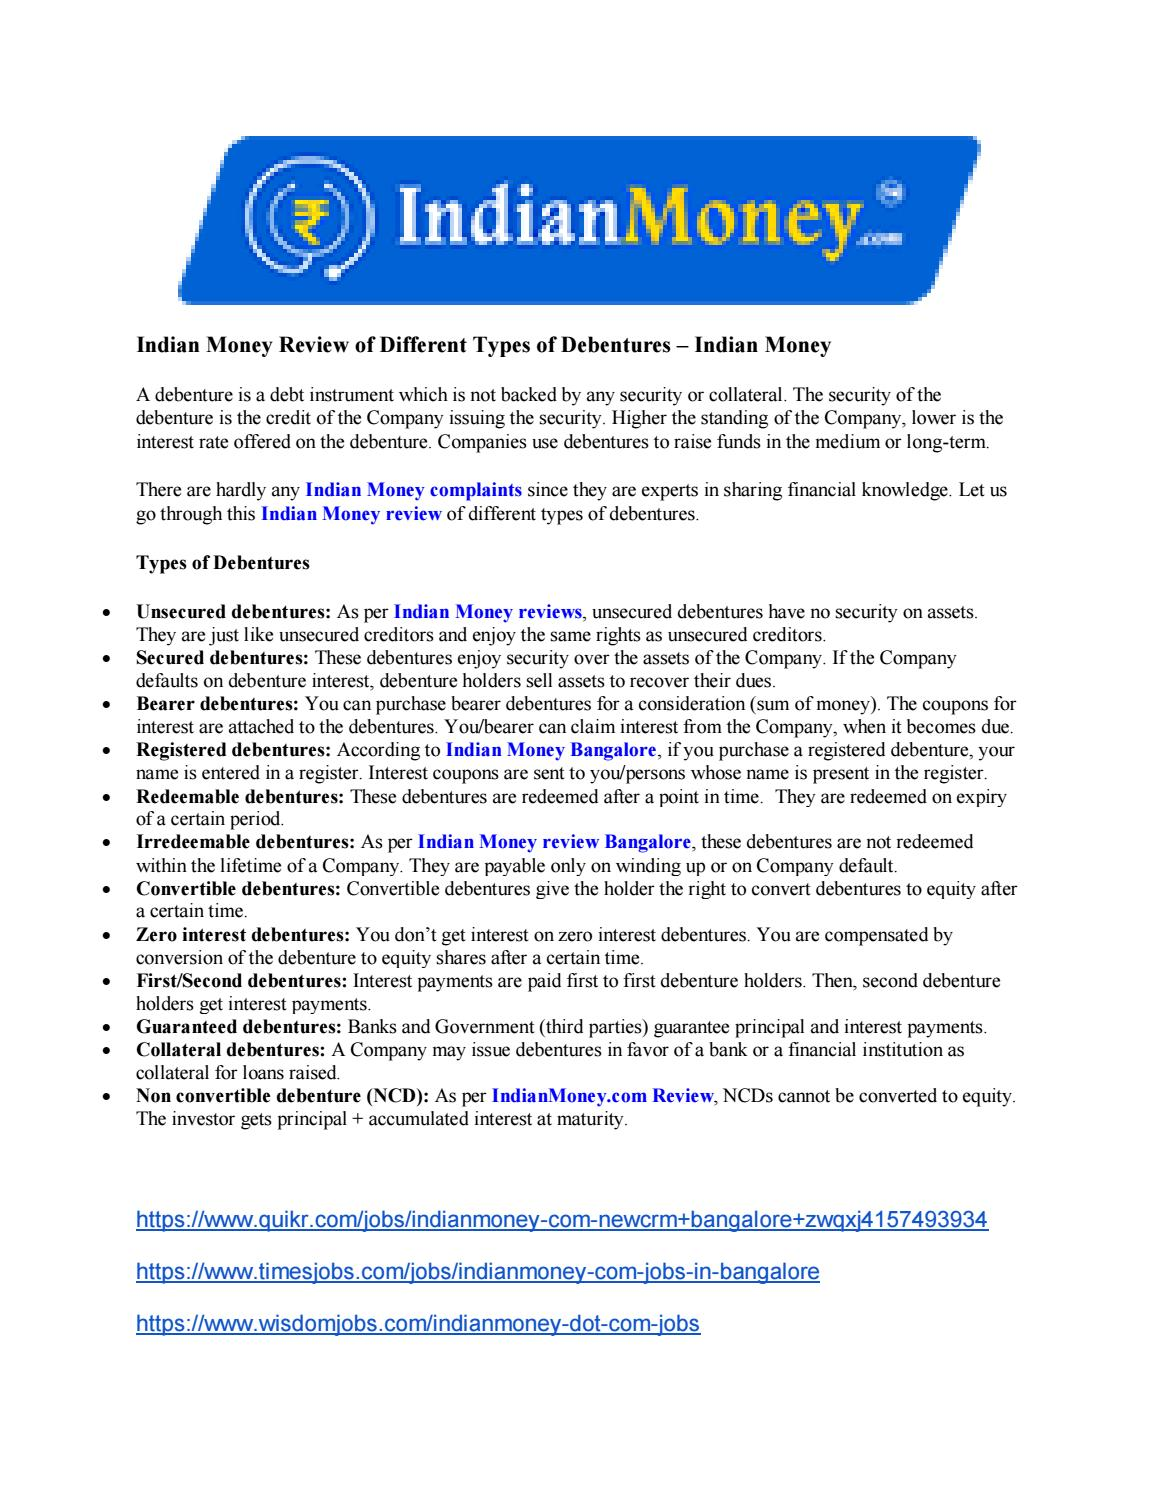 Indian Money Review of Different Types of Debentures – Indian Money